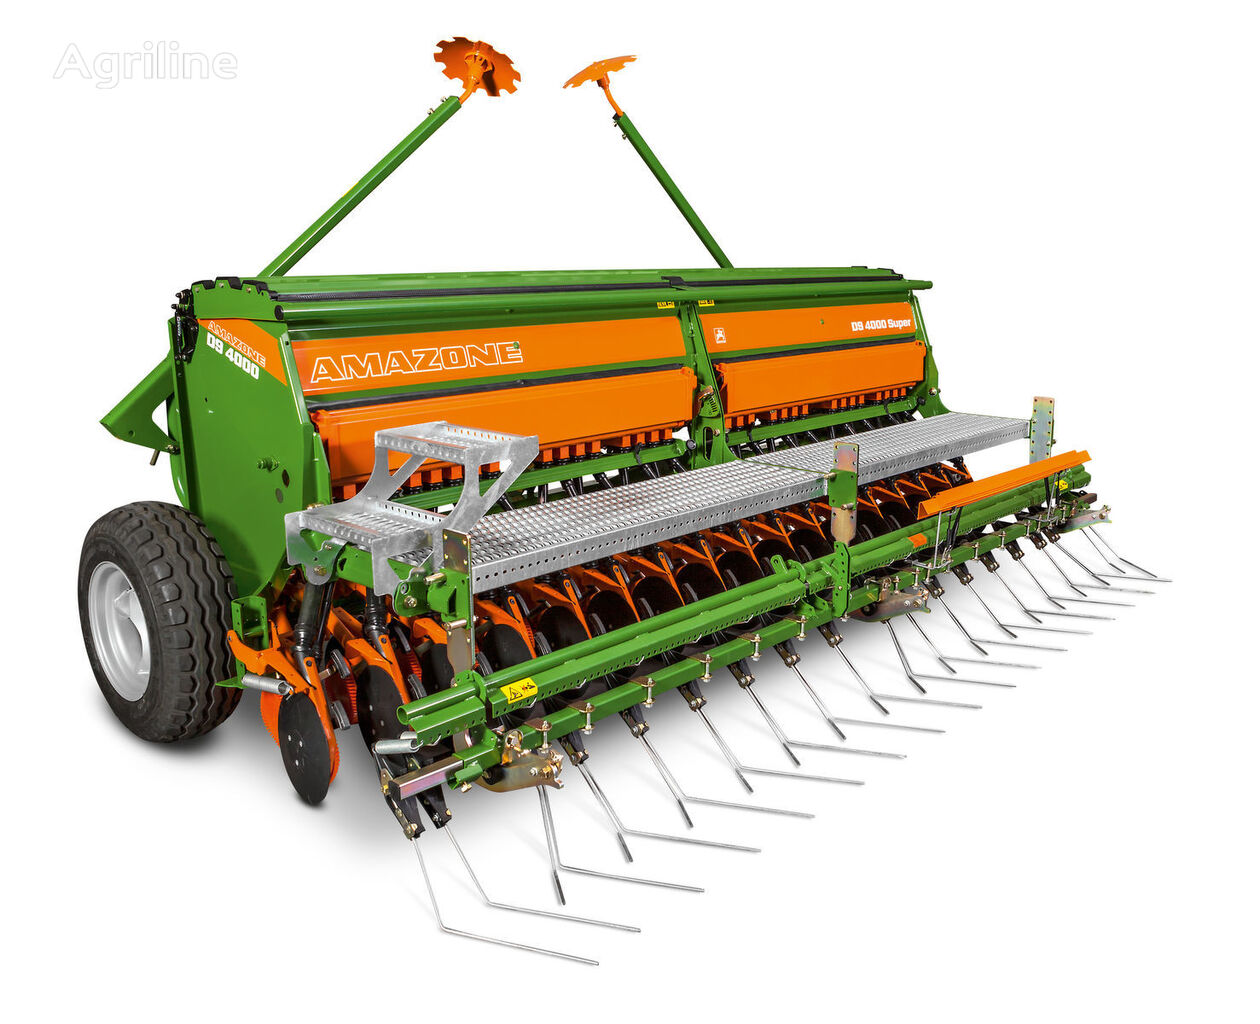 AMAZONE D9 4000, V NALIChII, TORG ! semeador mecânico novo